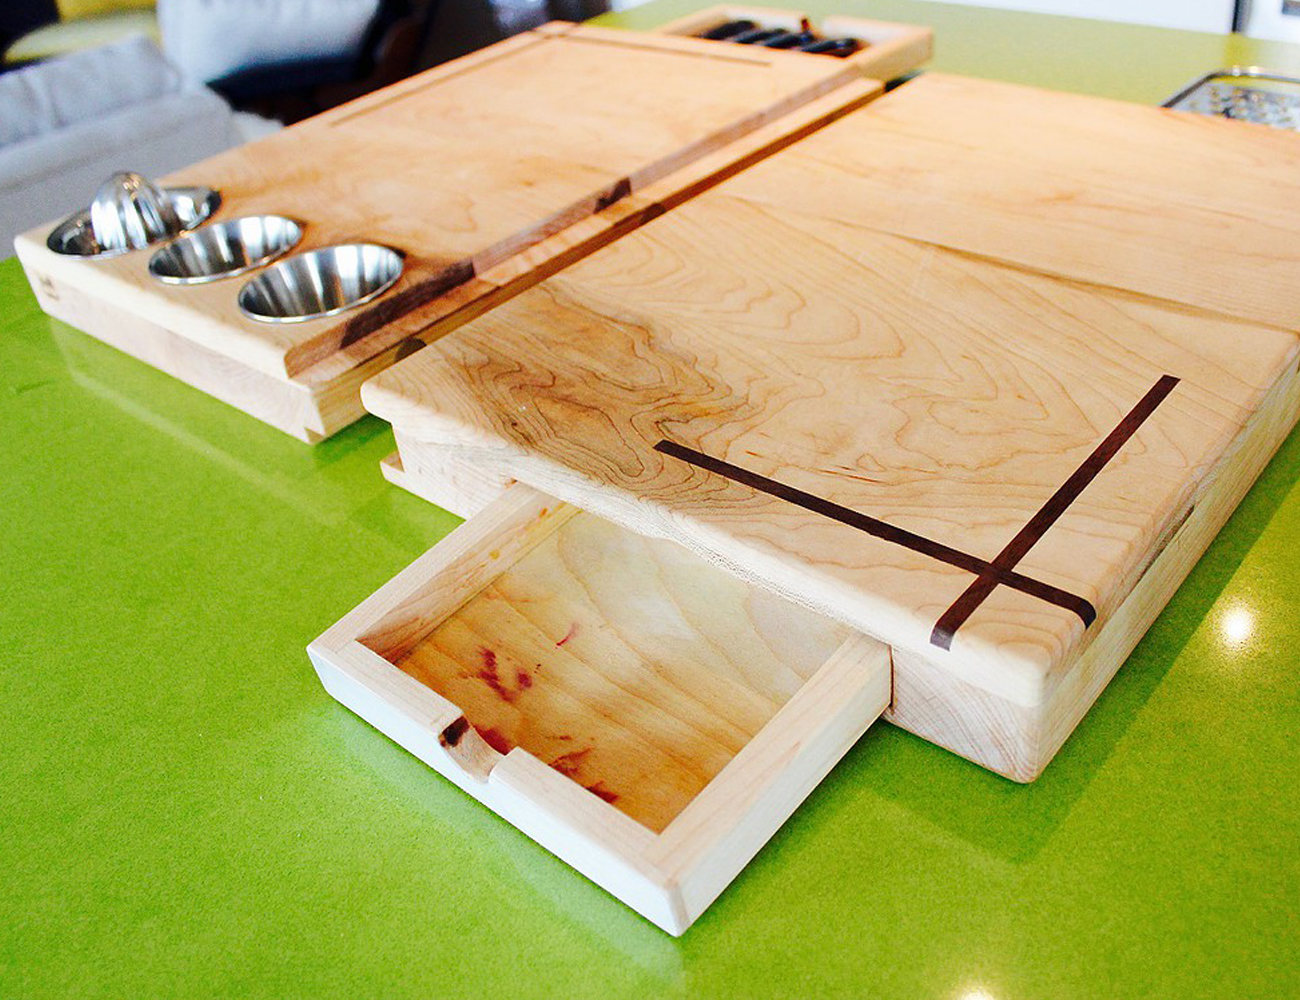 The Ultimate Cutting Board